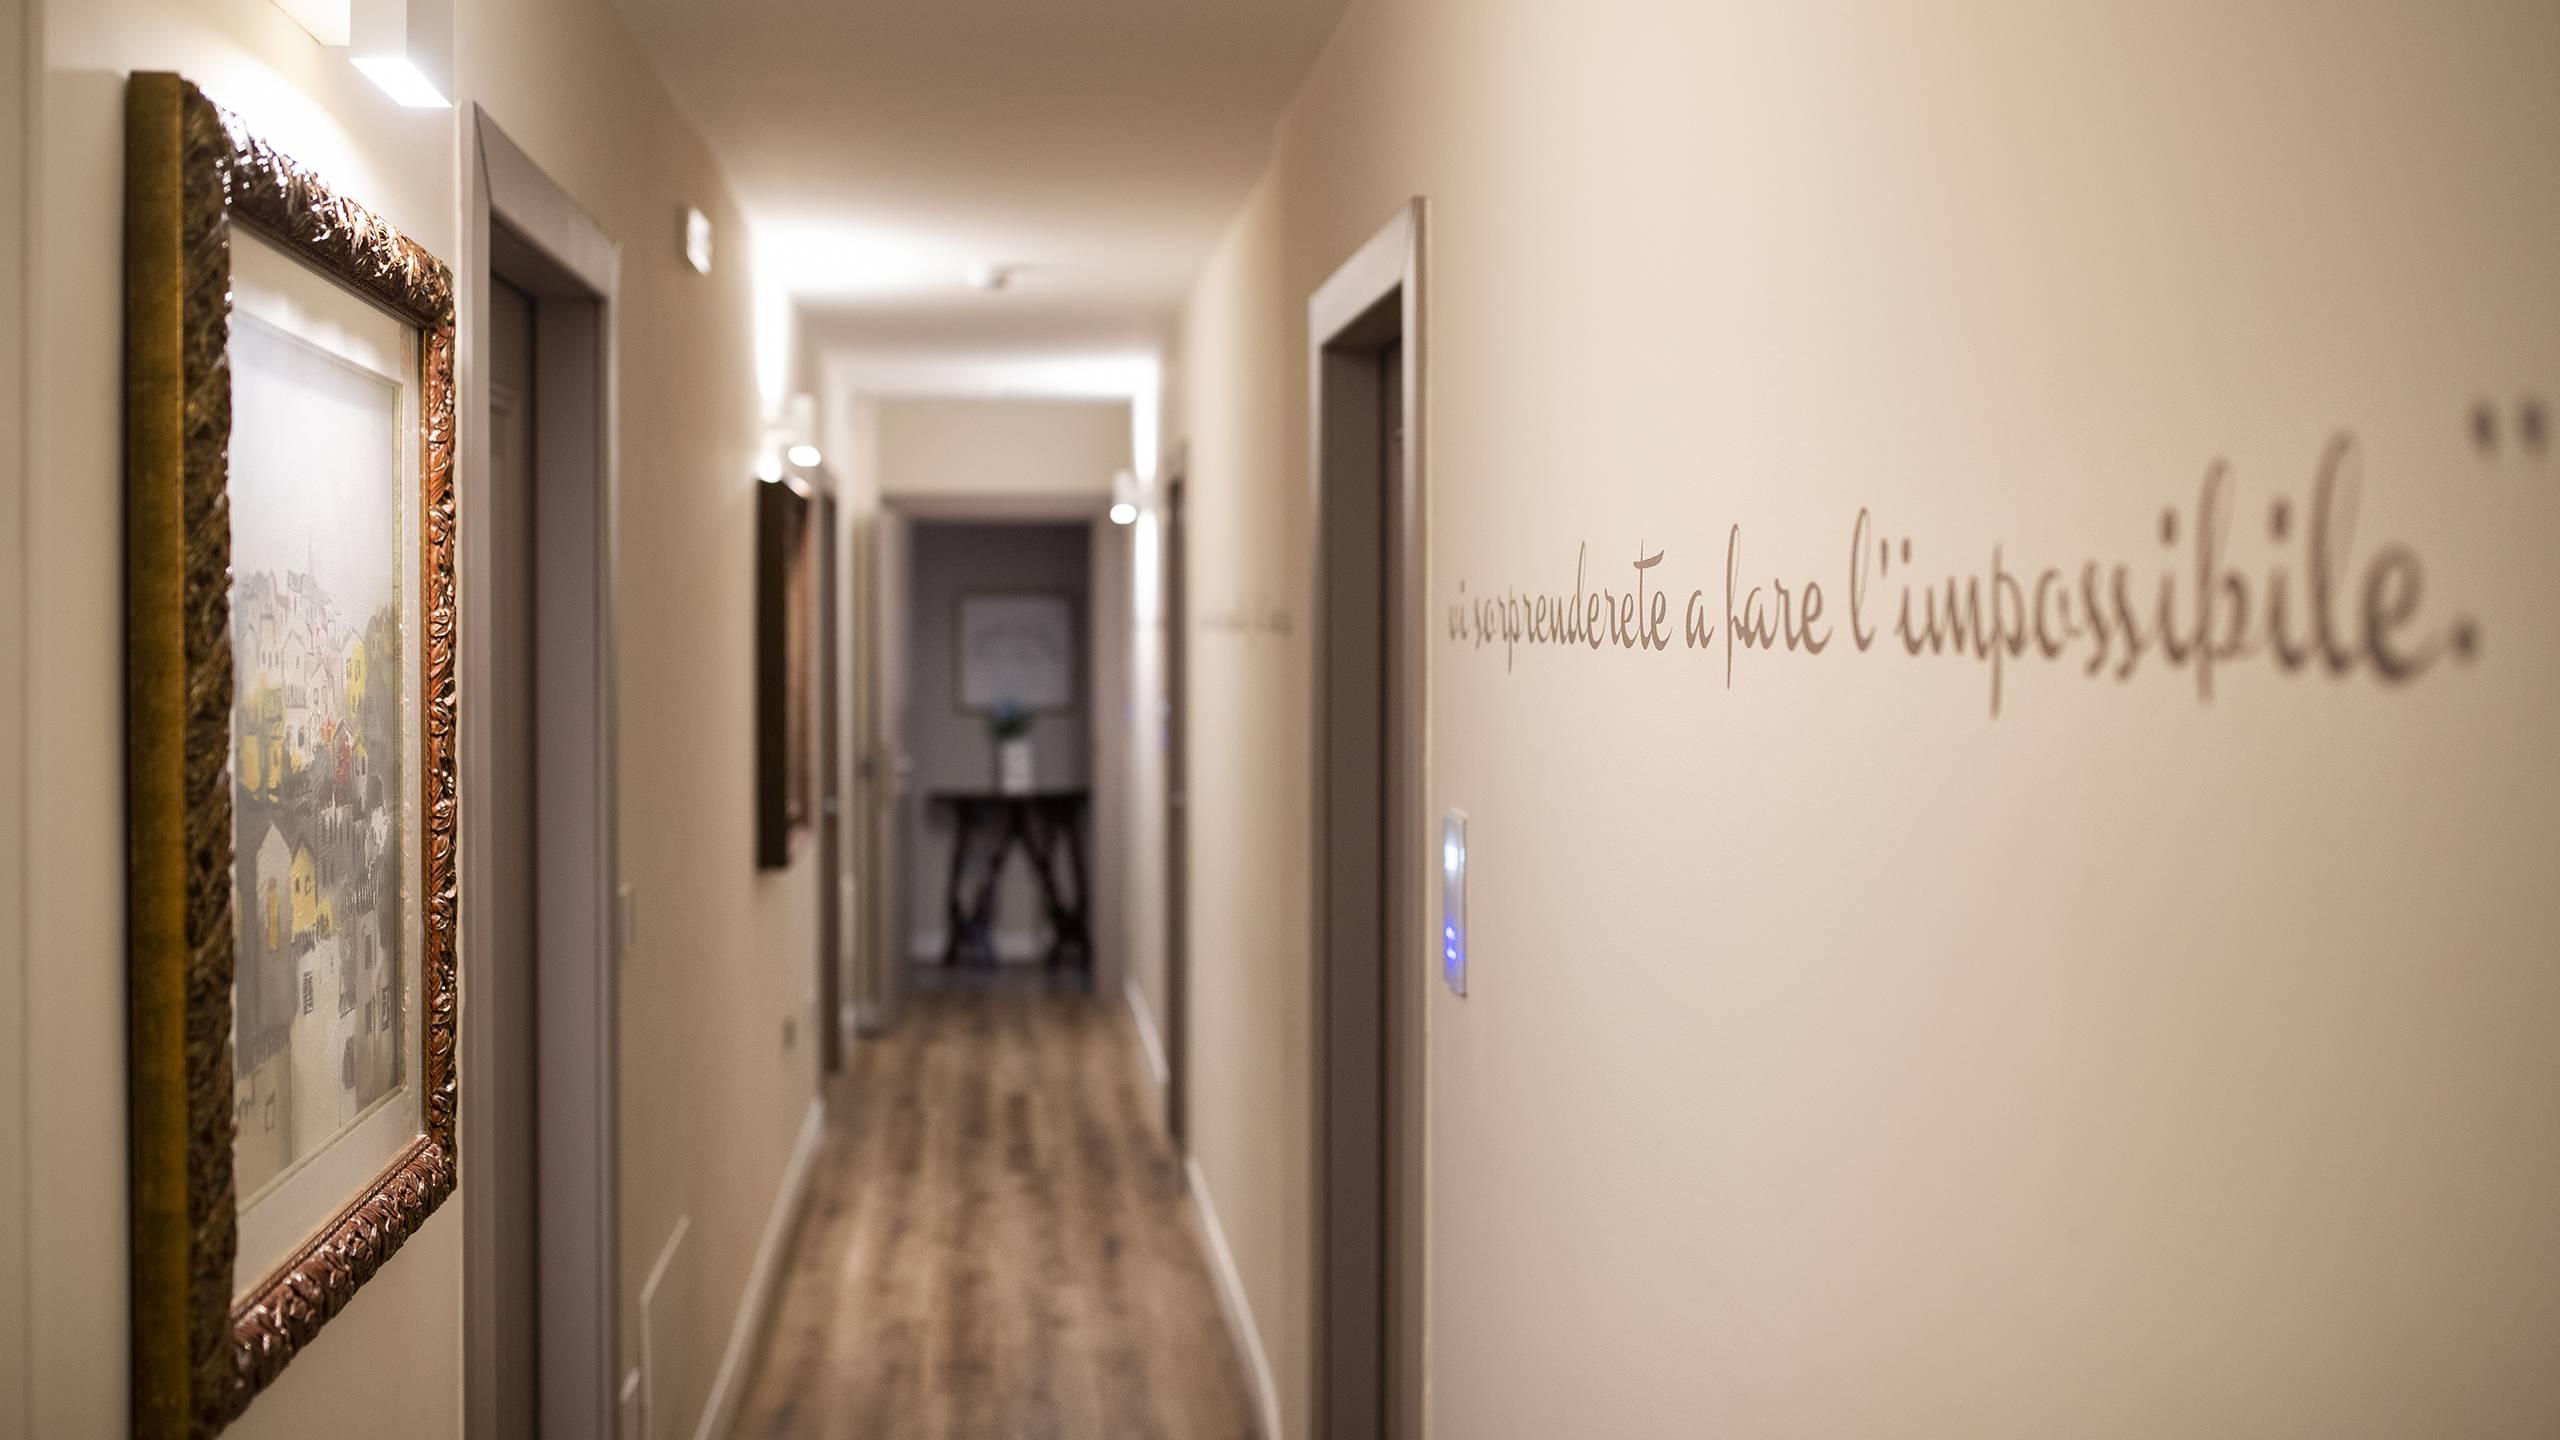 Fontebella-Palace-Hotel-Assisi-interior-corridoioPPME4143